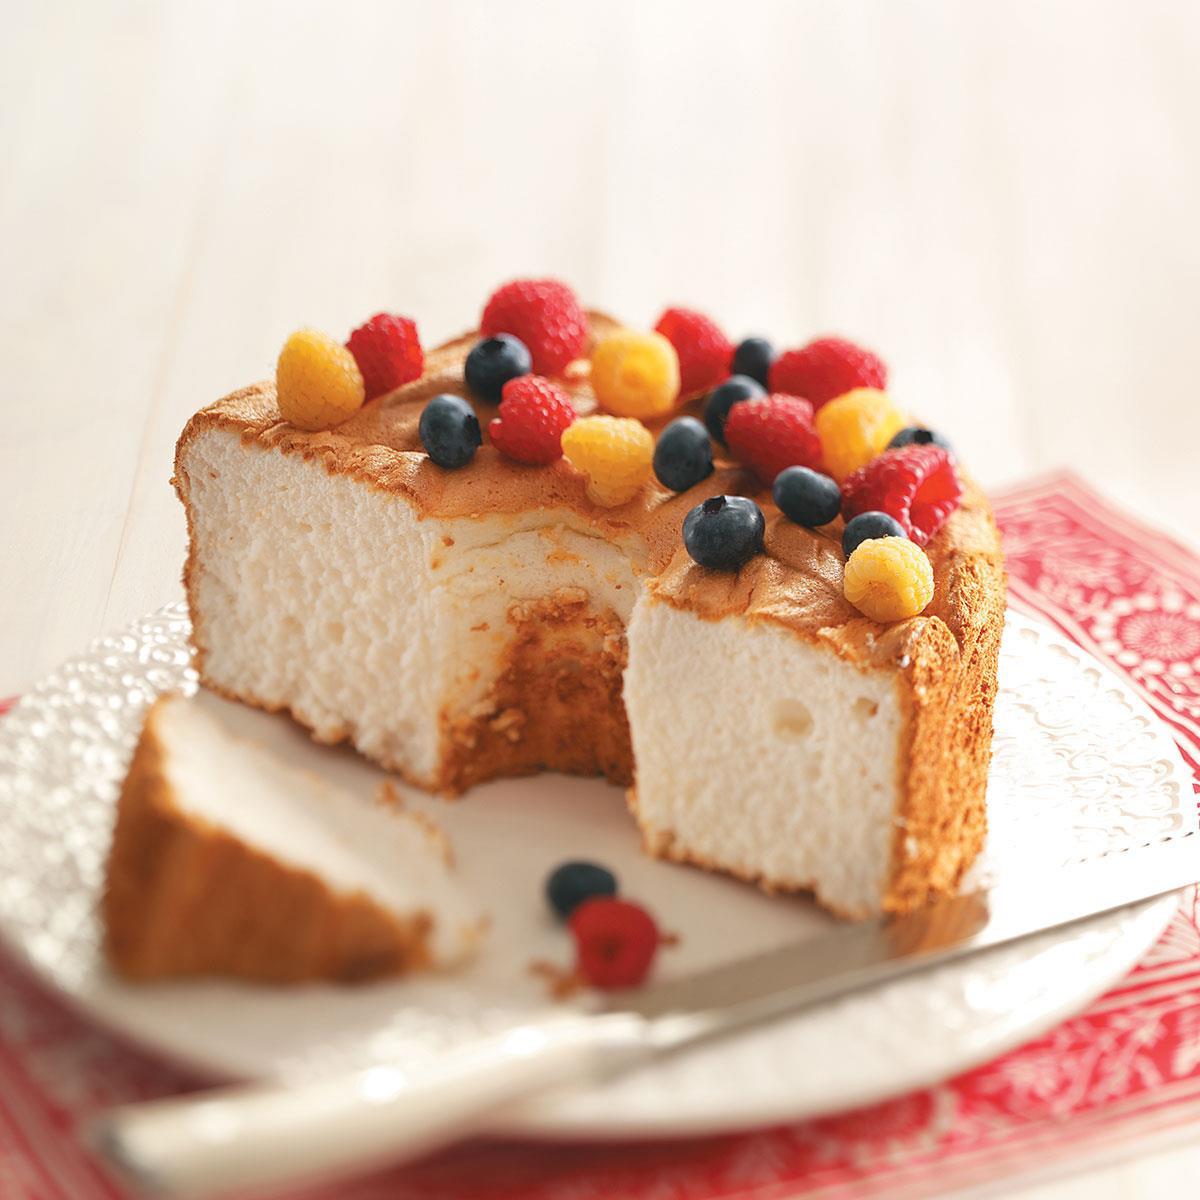 Gluten Free Dessert Ideas  Gluten Free Angel Food Cake Recipe